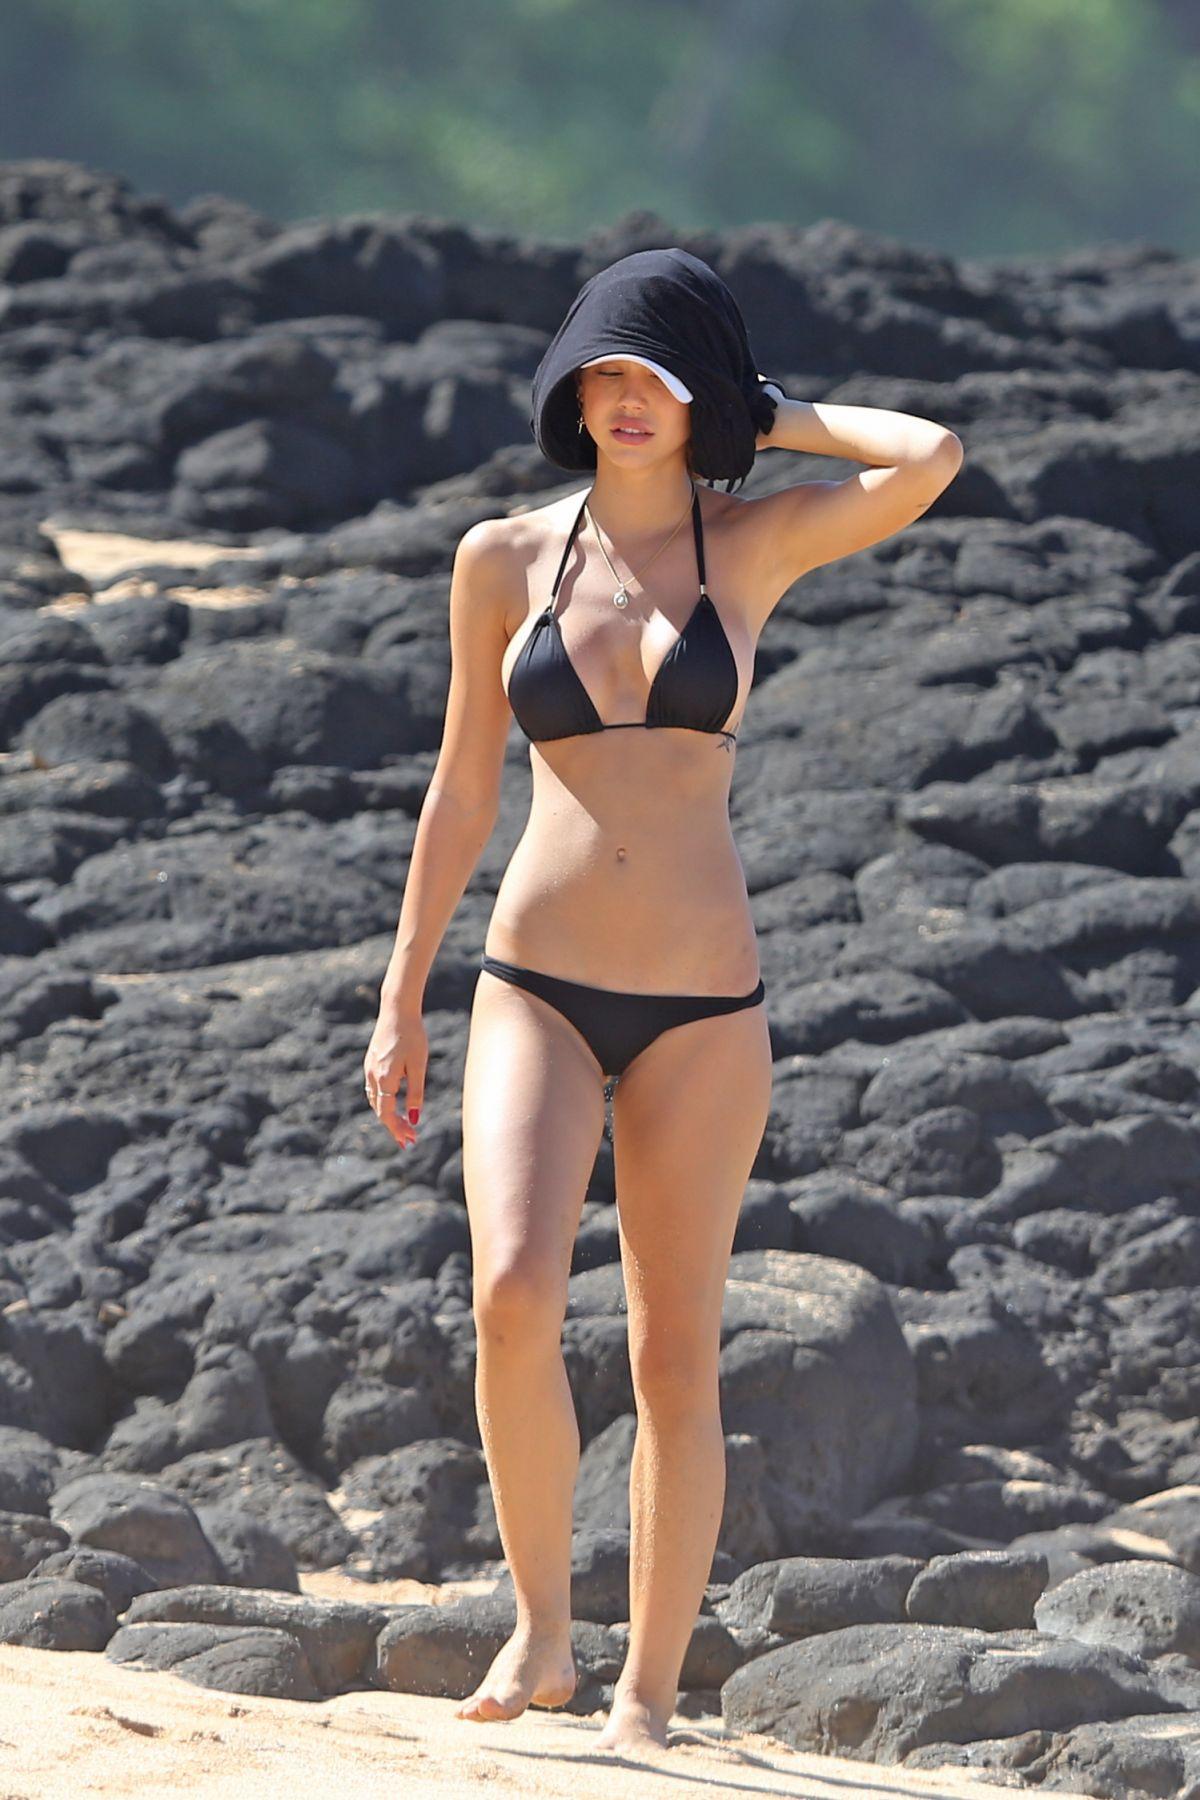 Bikini Alexis Ren nude (75 foto and video), Topless, Paparazzi, Twitter, panties 2019